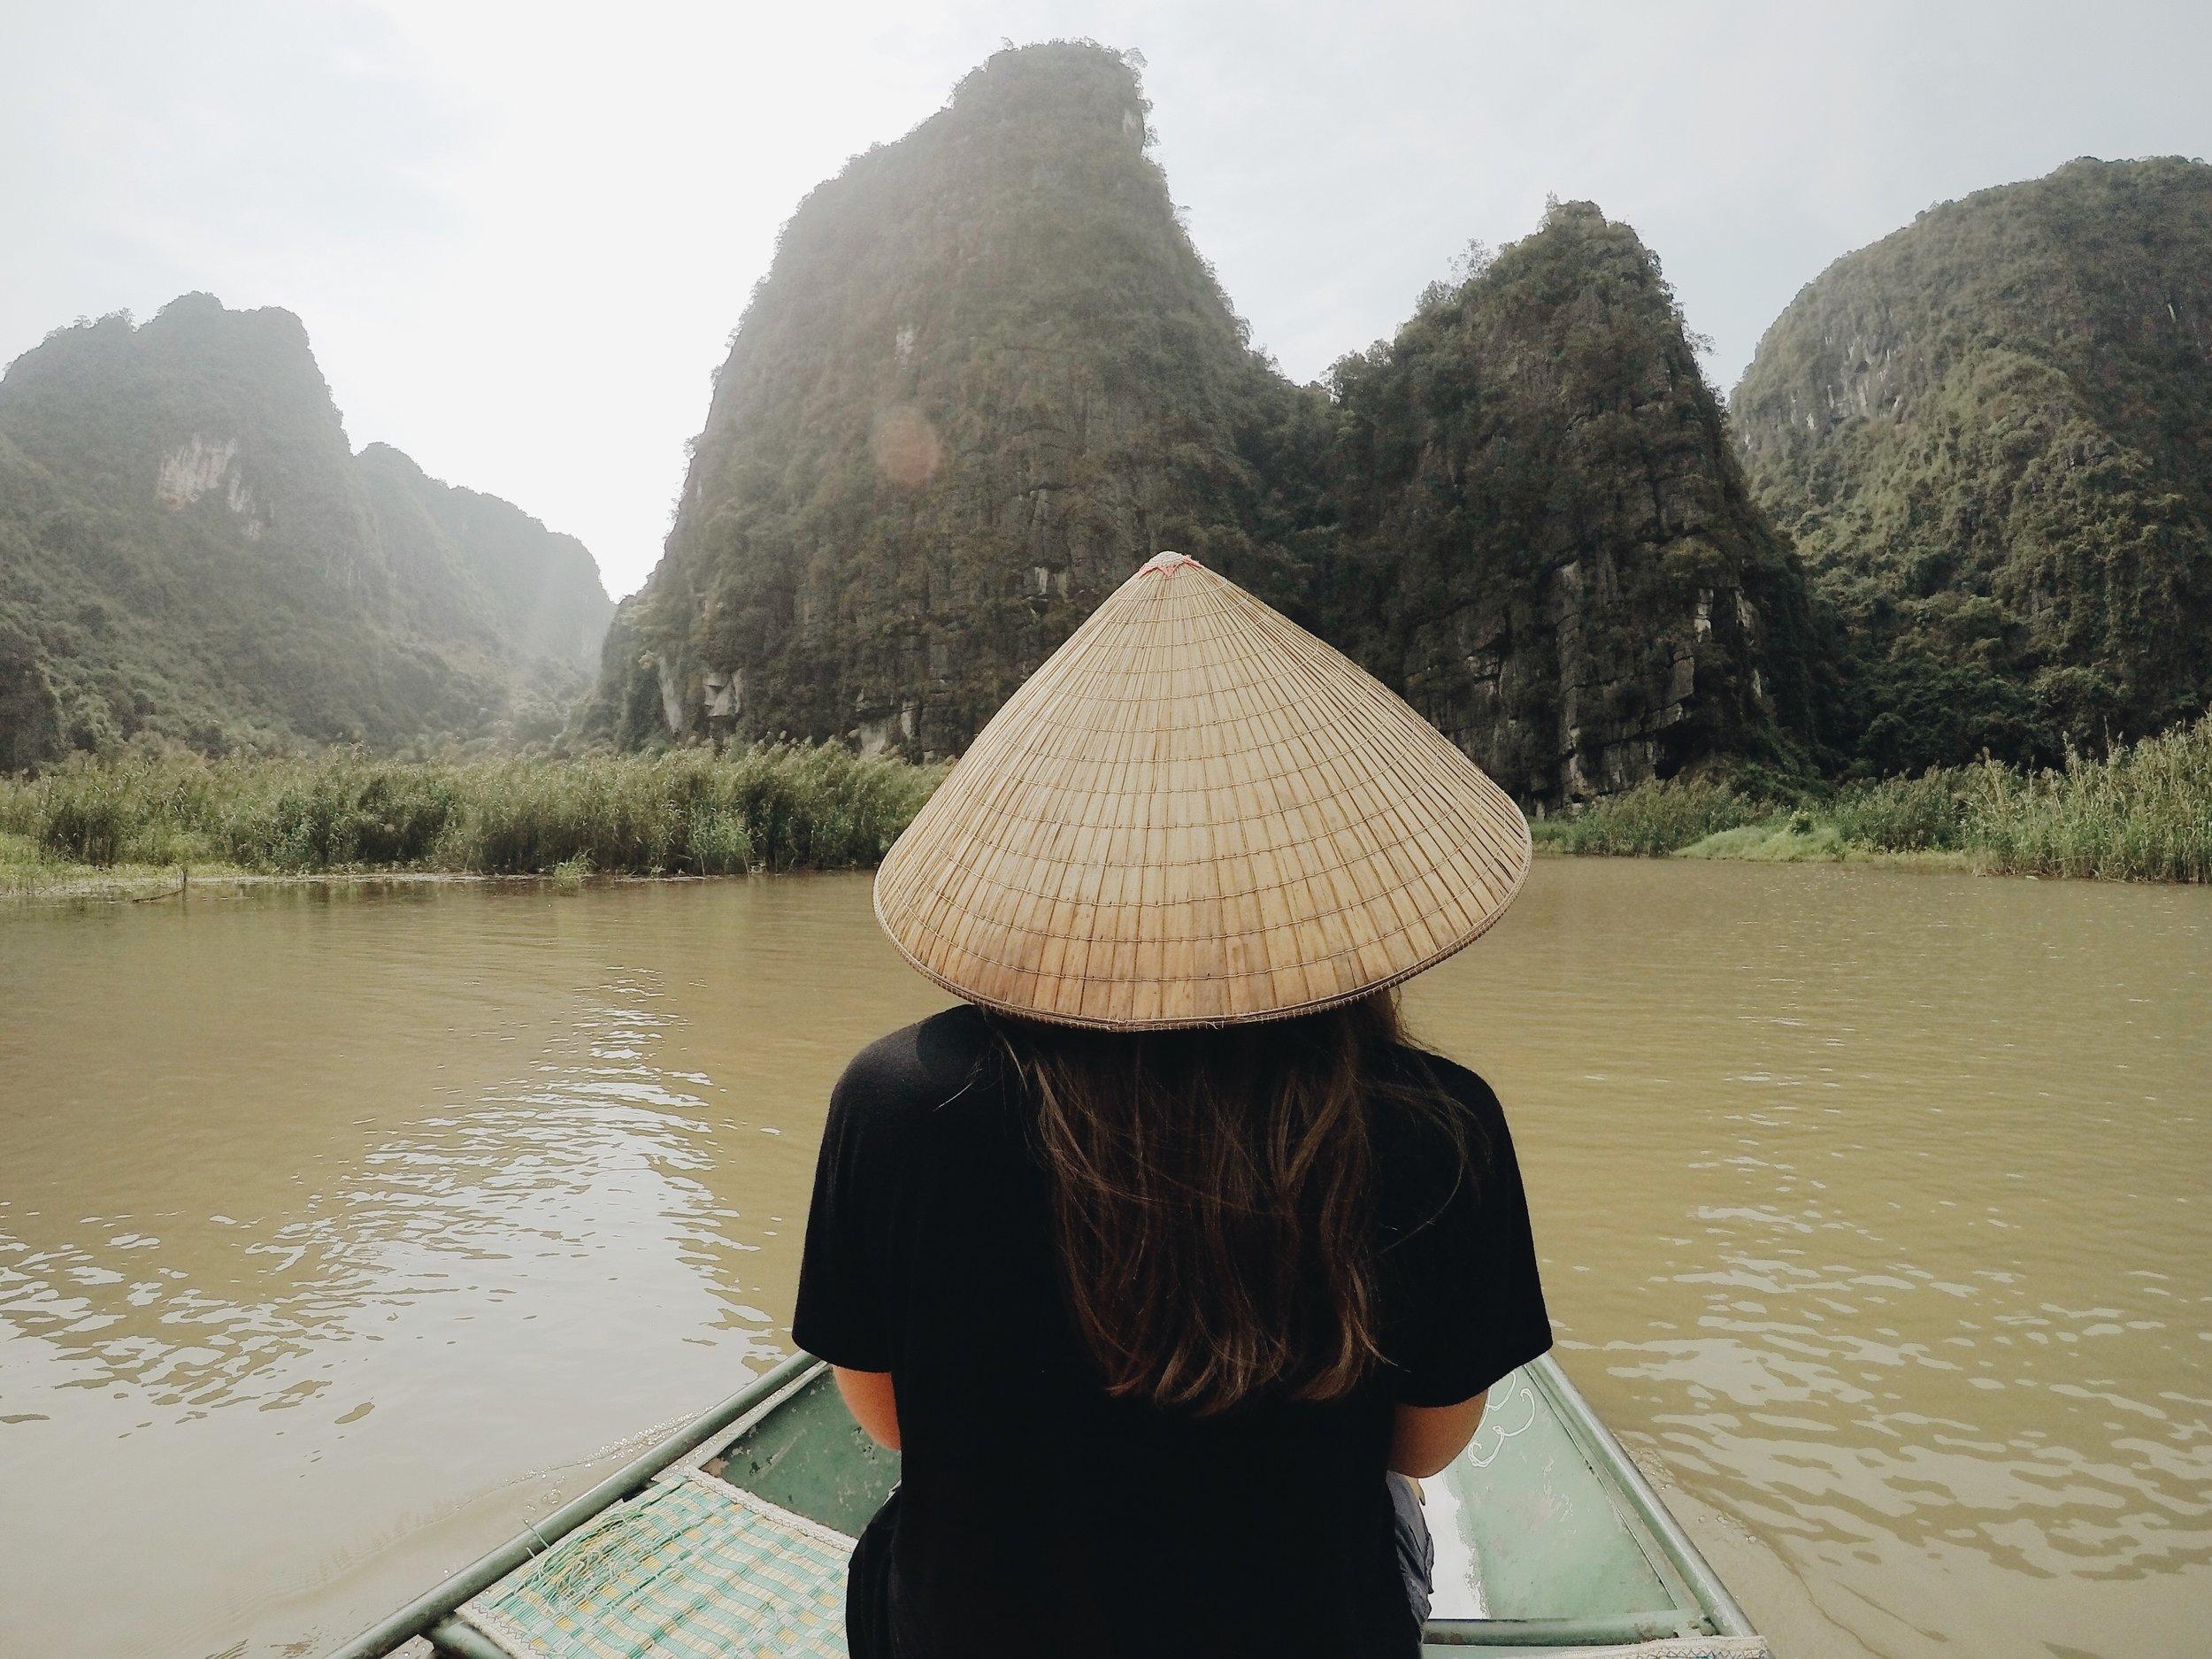 tam-coc-vietnam-voyage-que-faire.JPG